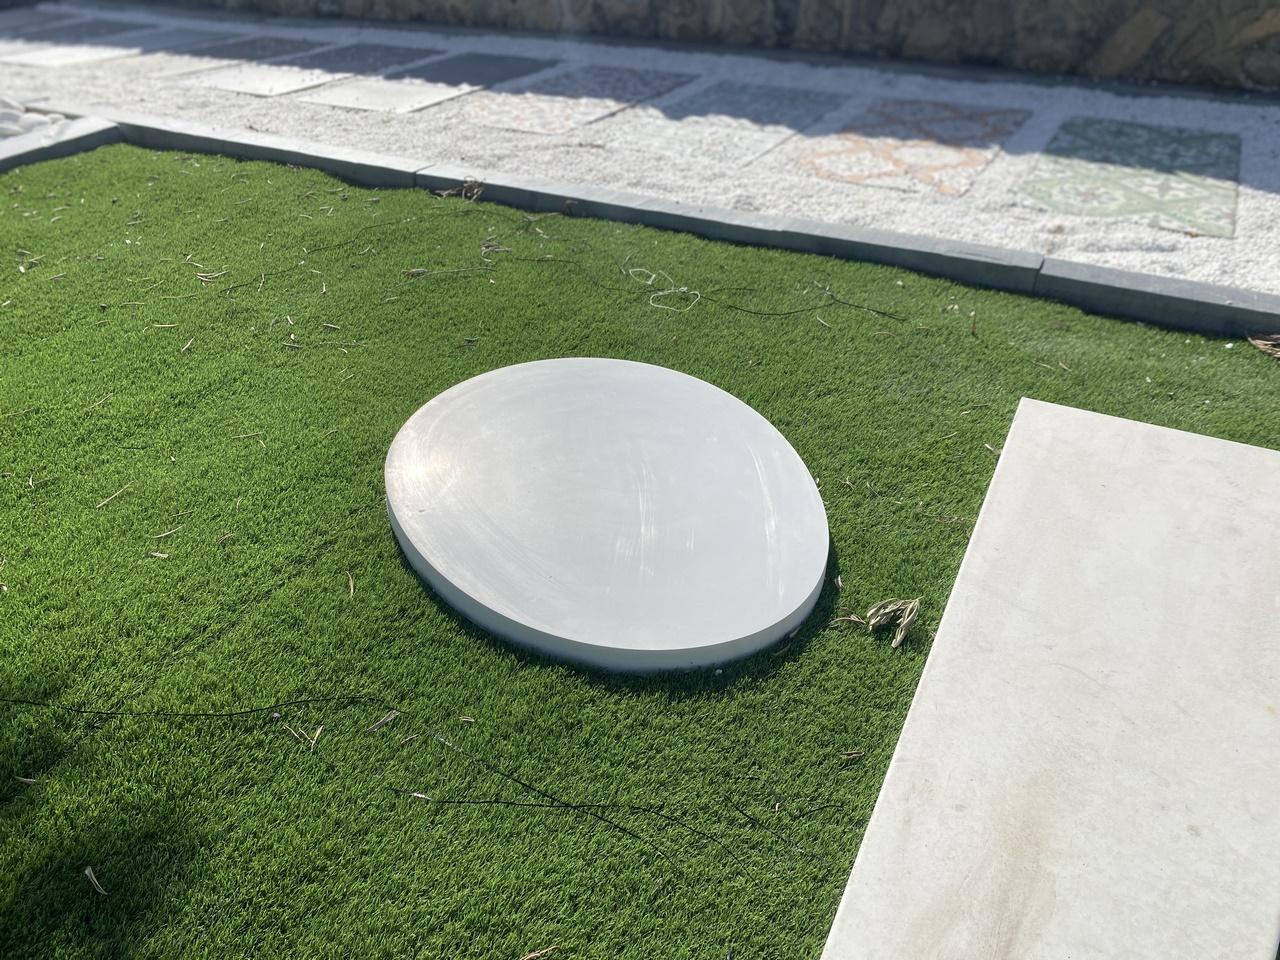 dalles-jardin-beton-pebble_1280x960 (14)